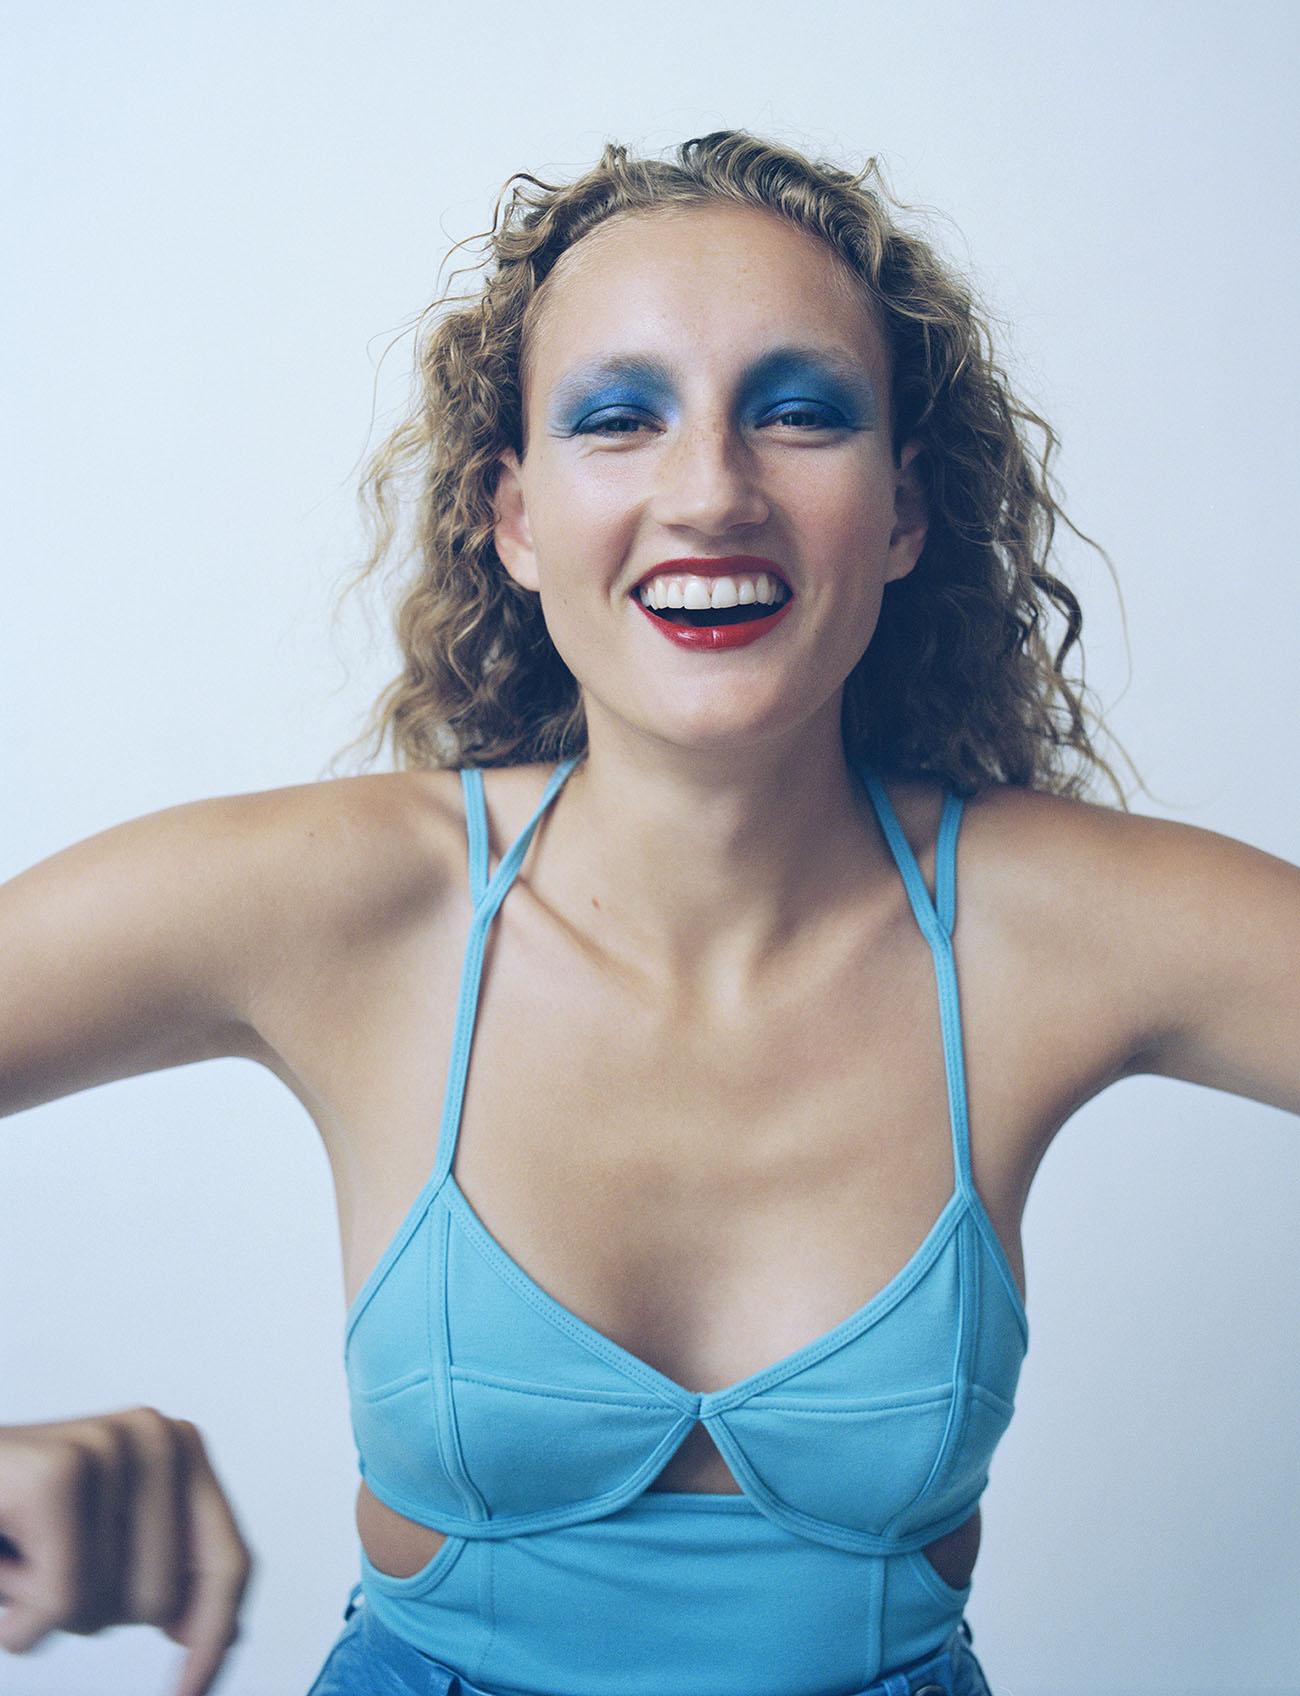 Agnes Nieske Abma by Dennis Stenild for Elle Mexico October 2020